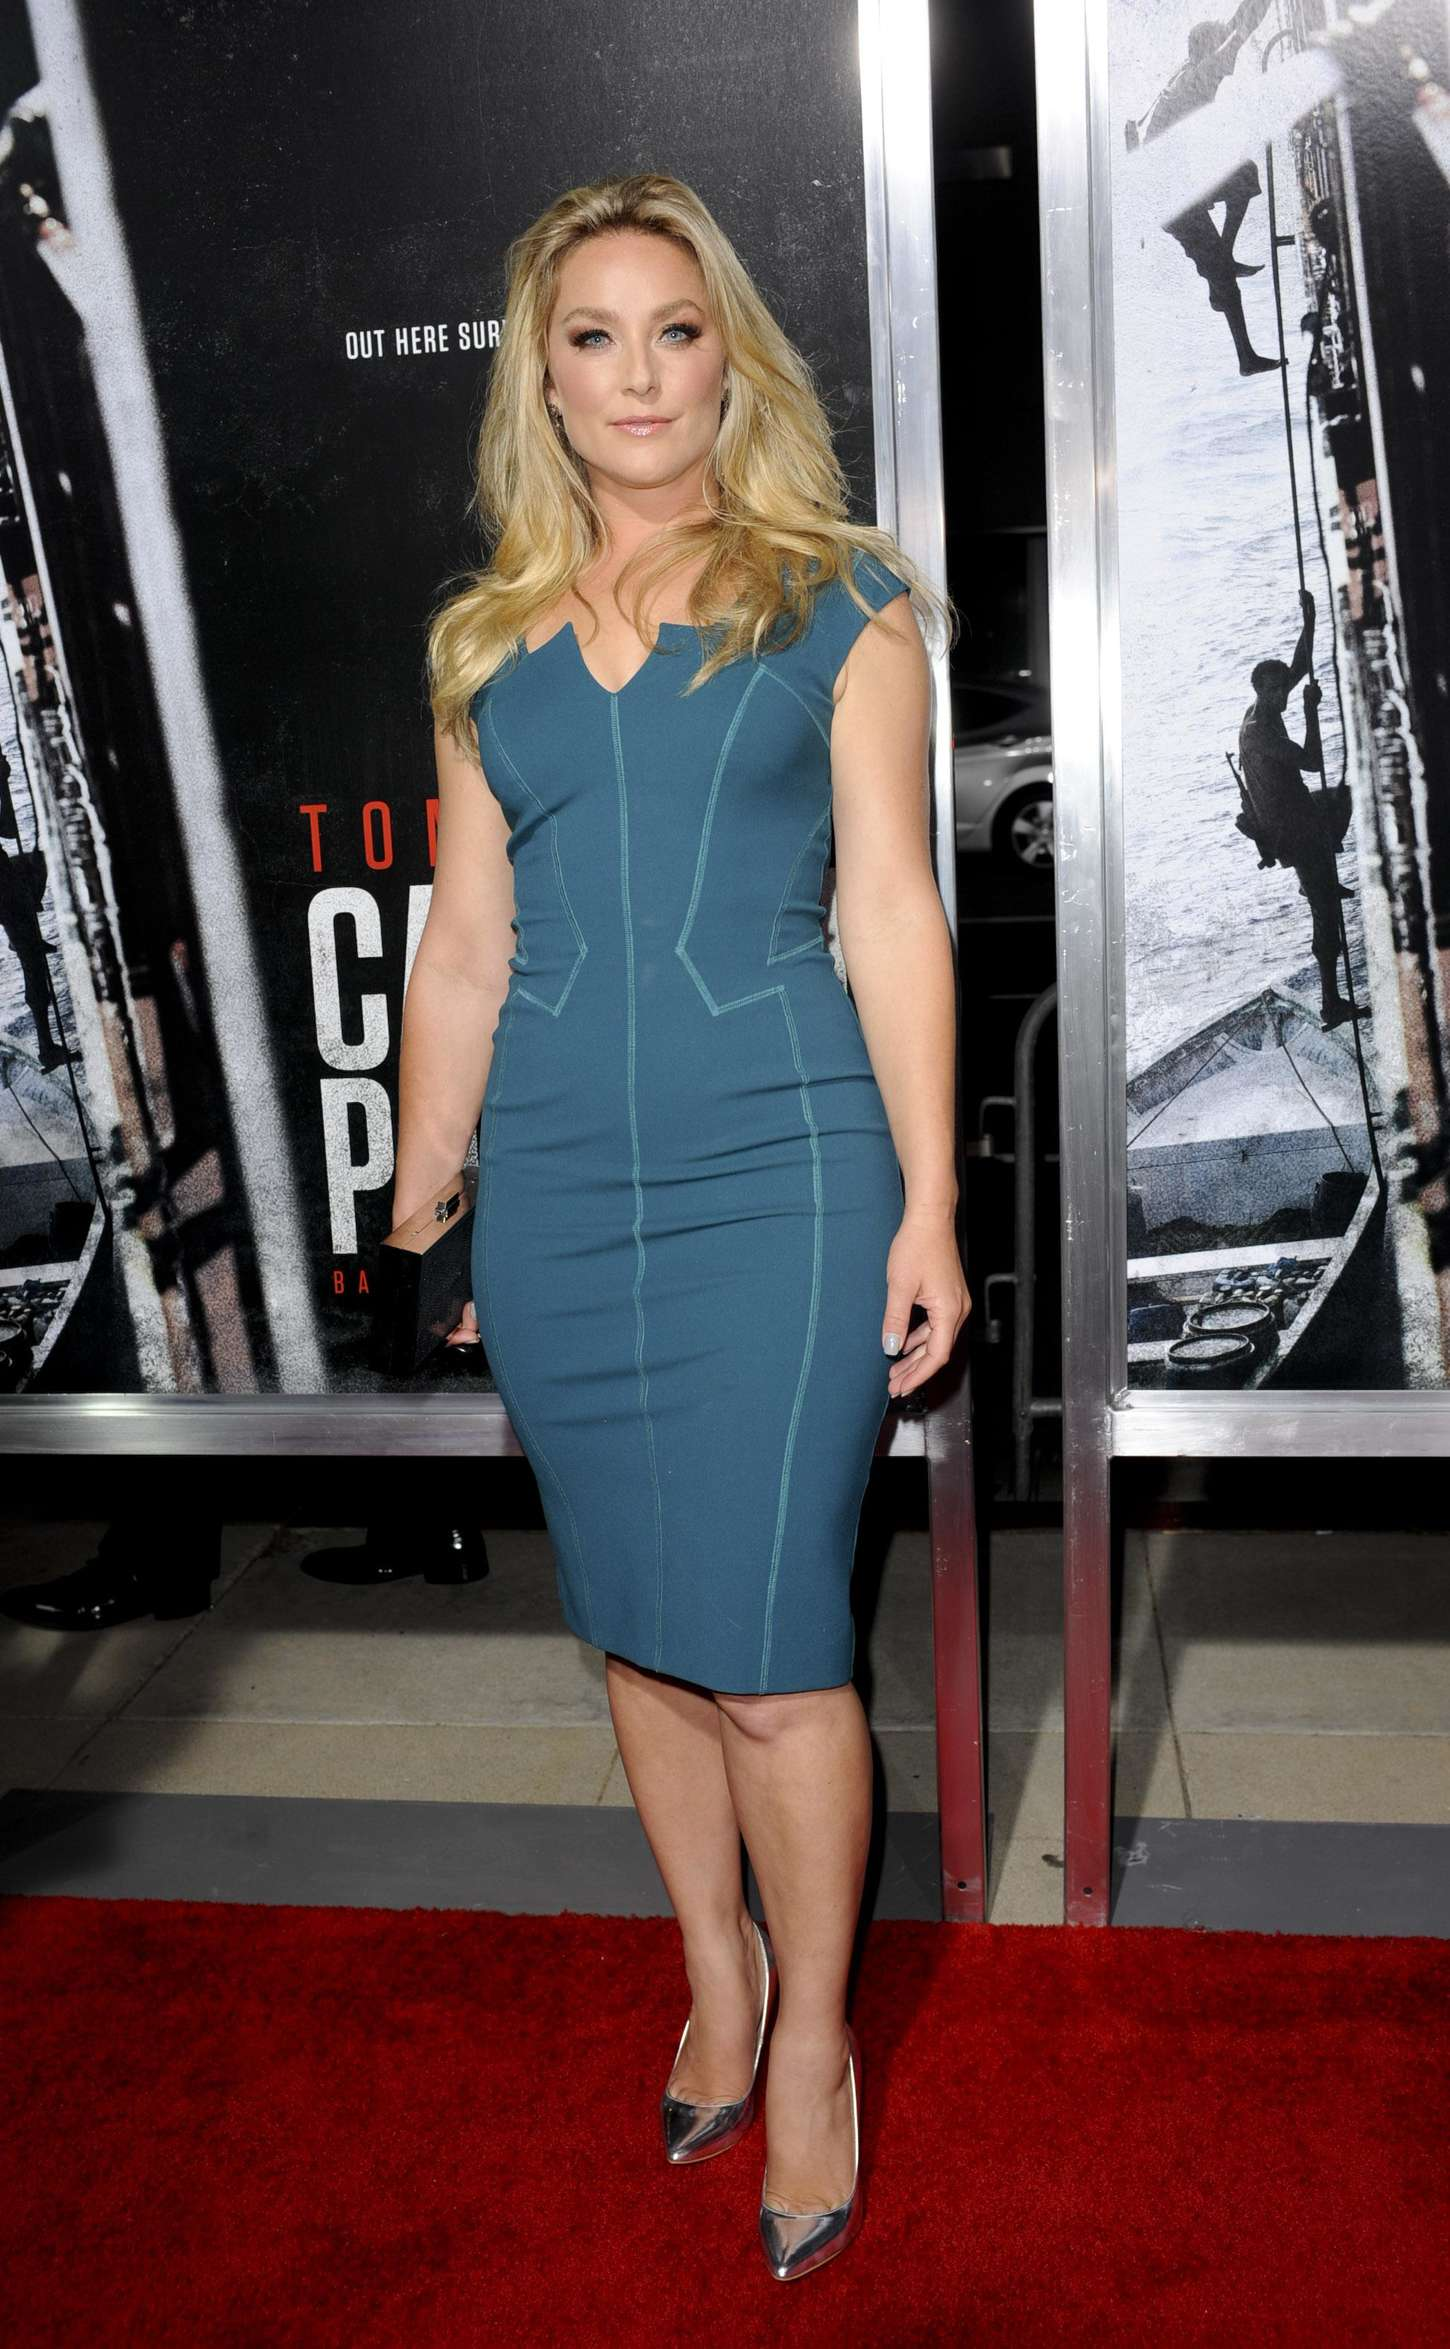 Elisabeth Rohm at Captain Phillips Premiere in Los Angeles